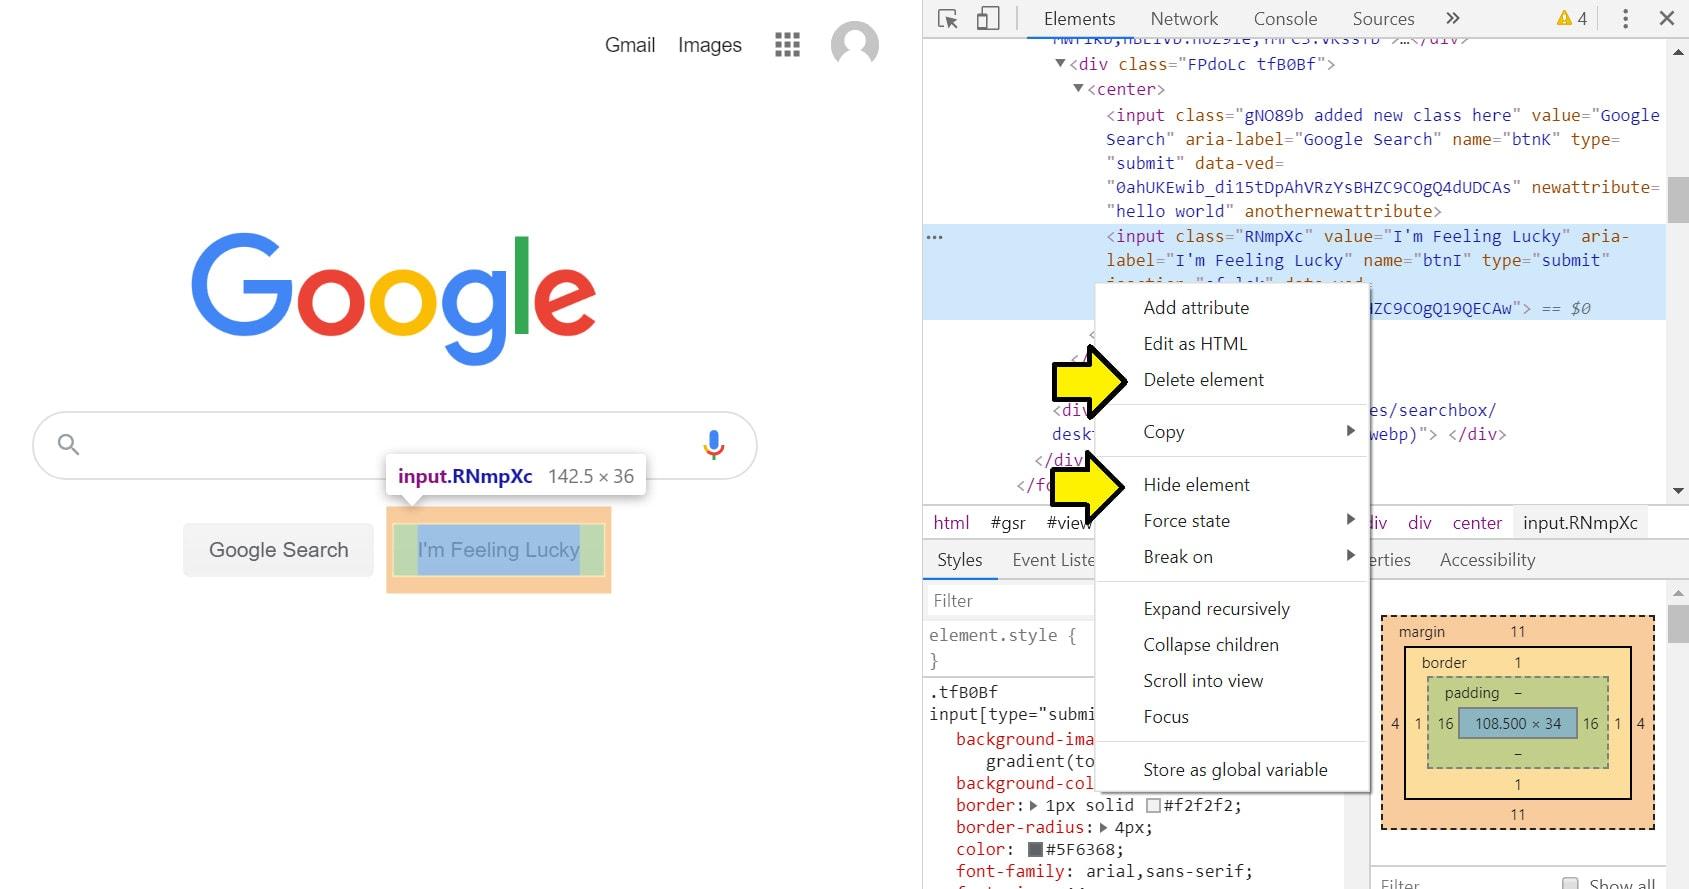 Chrome delete option